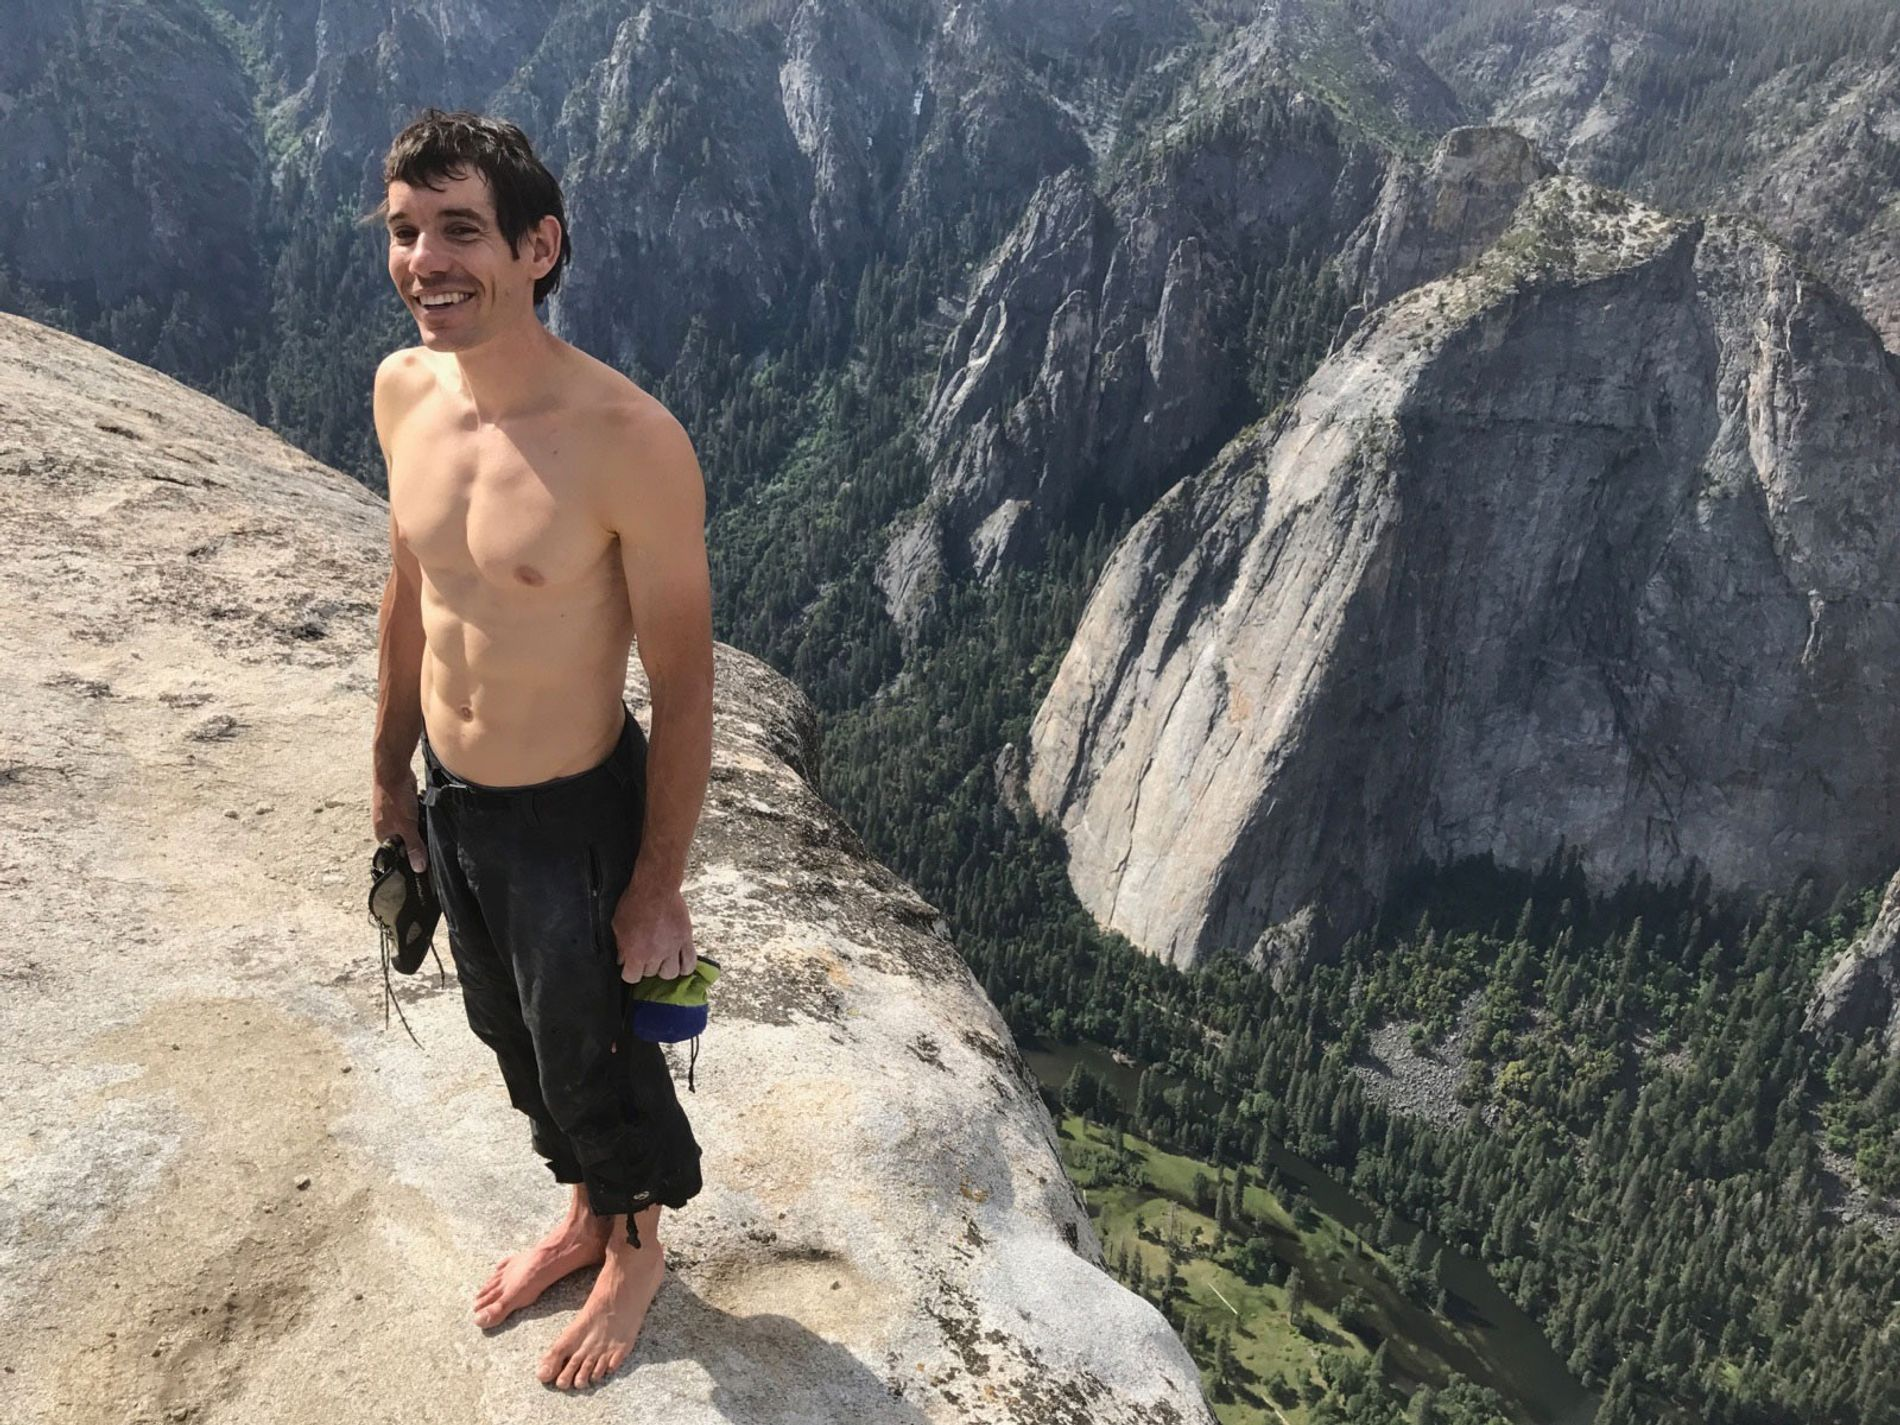 Exclusivo: Alpinista Completa a Escalada Sem Corda Mais Perigosa de Sempre